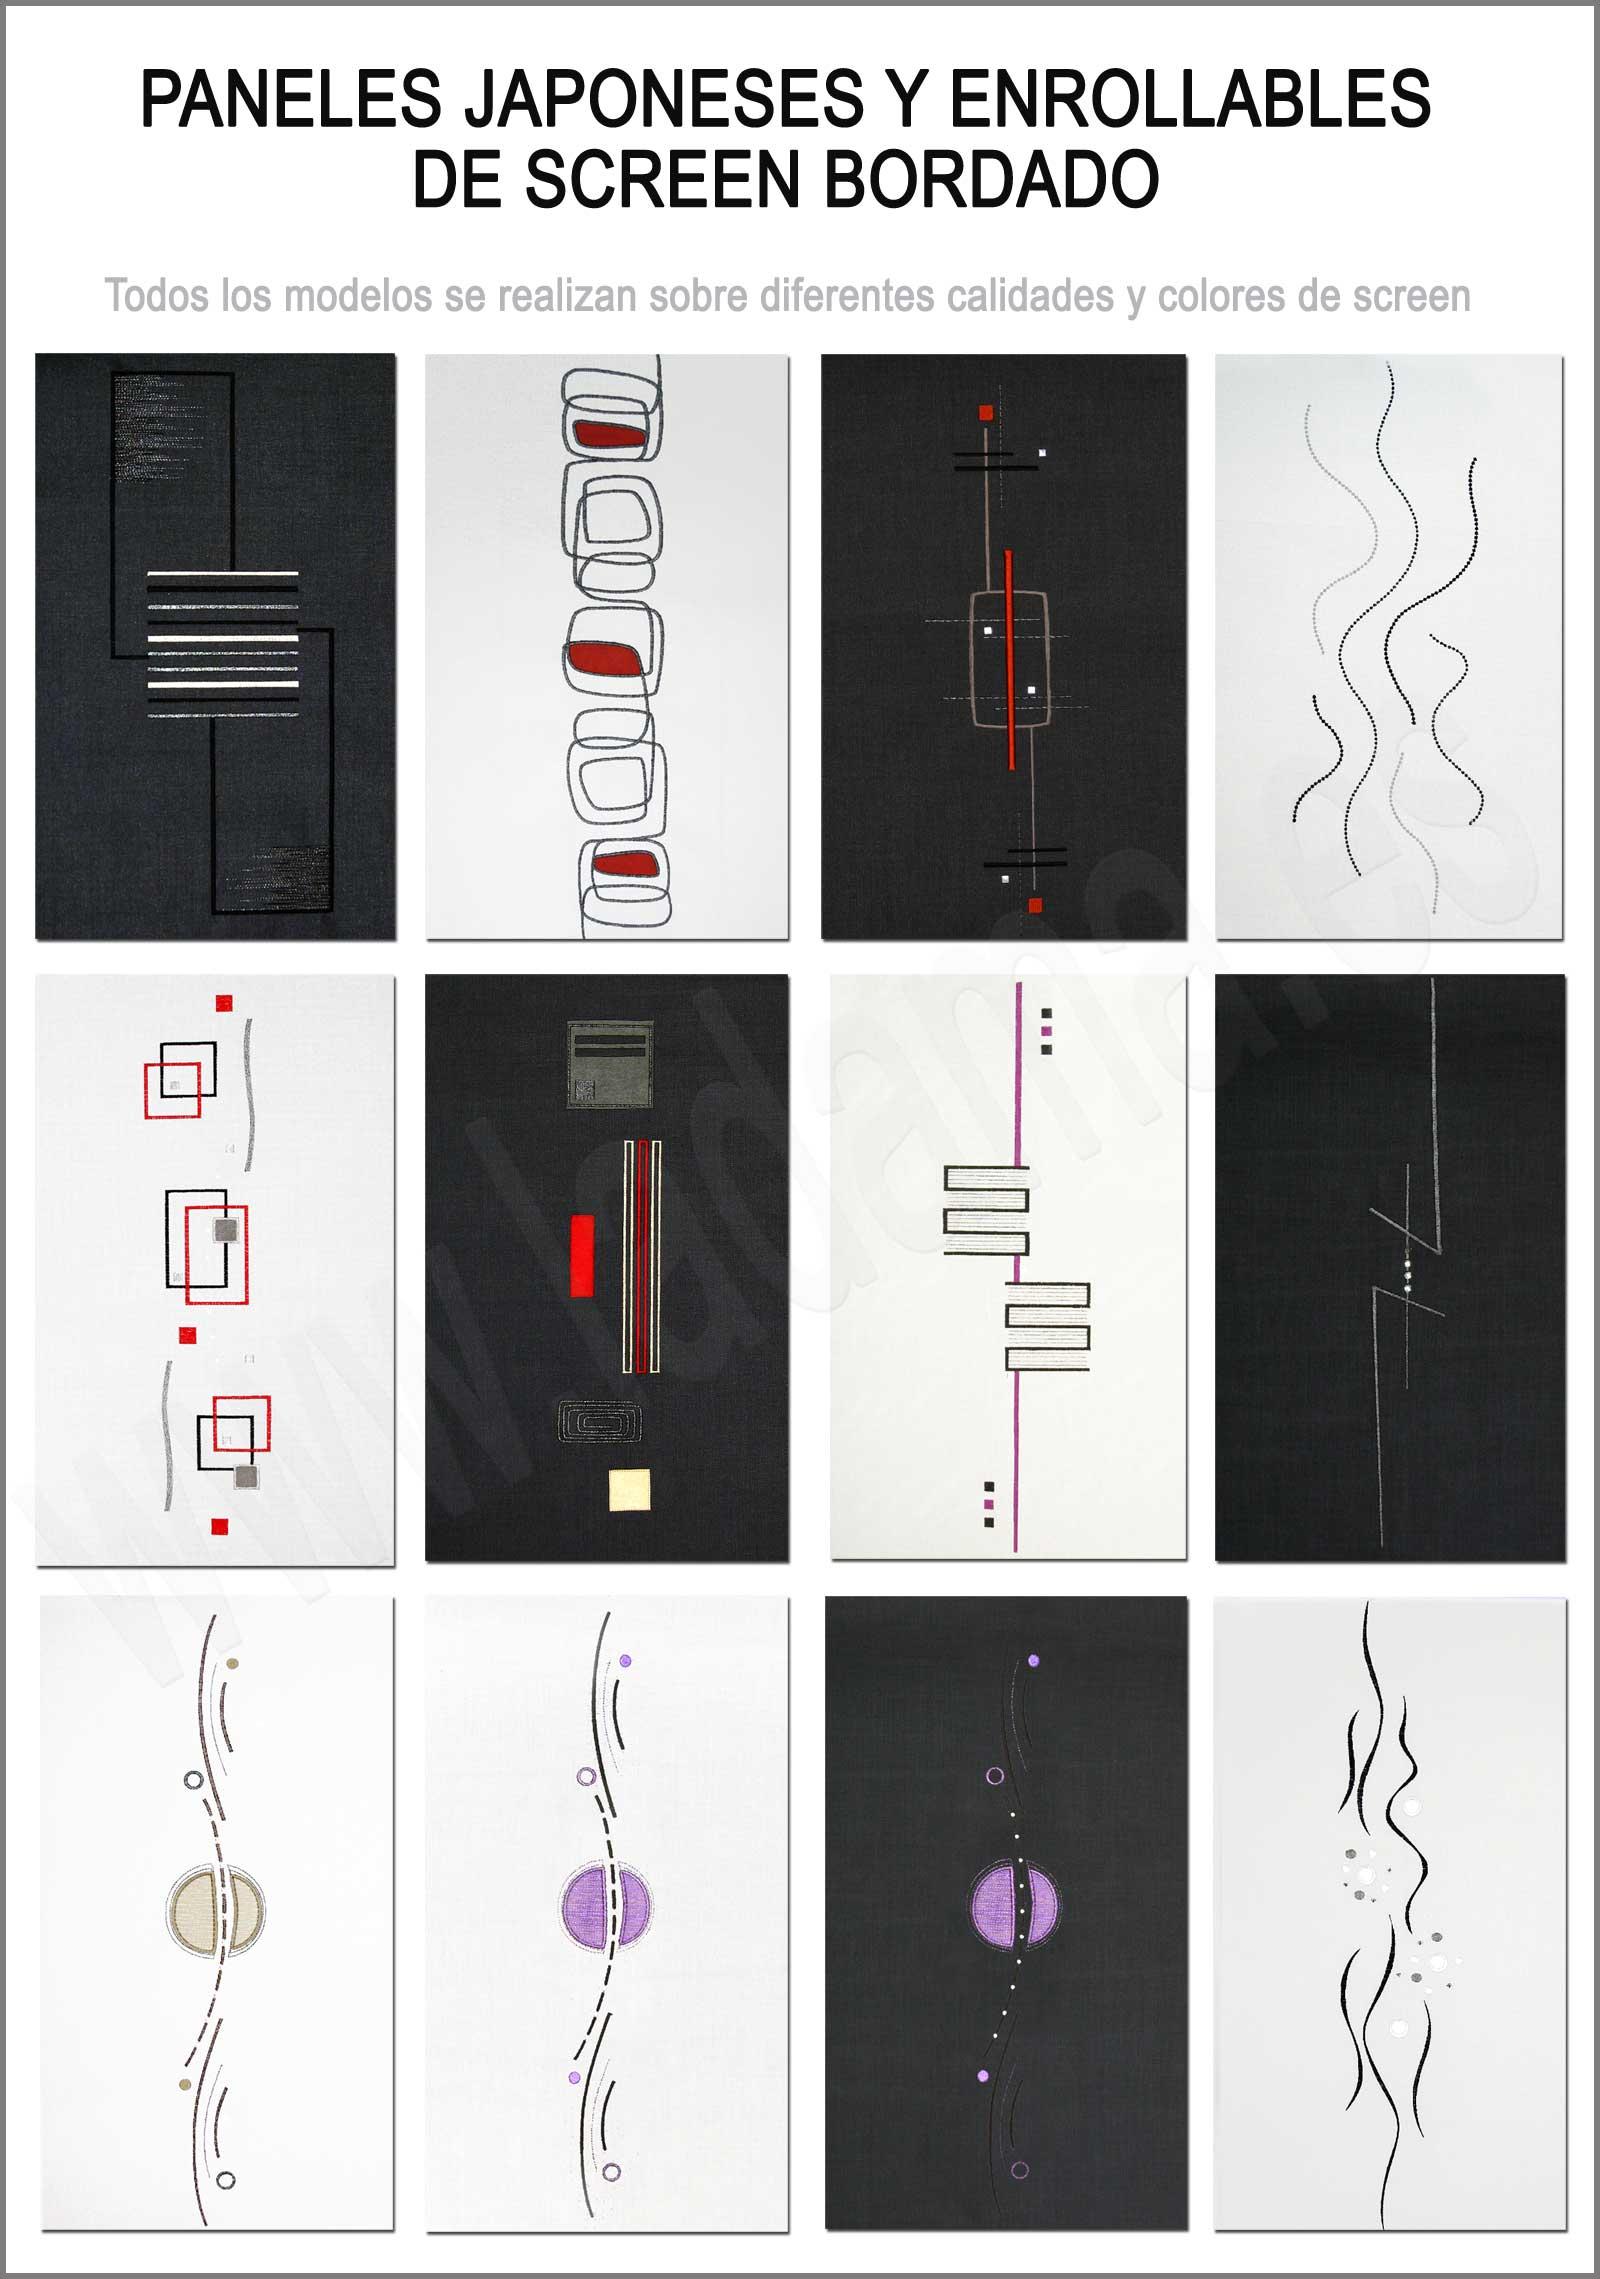 Tipos de Bordados para panel japonés de screen